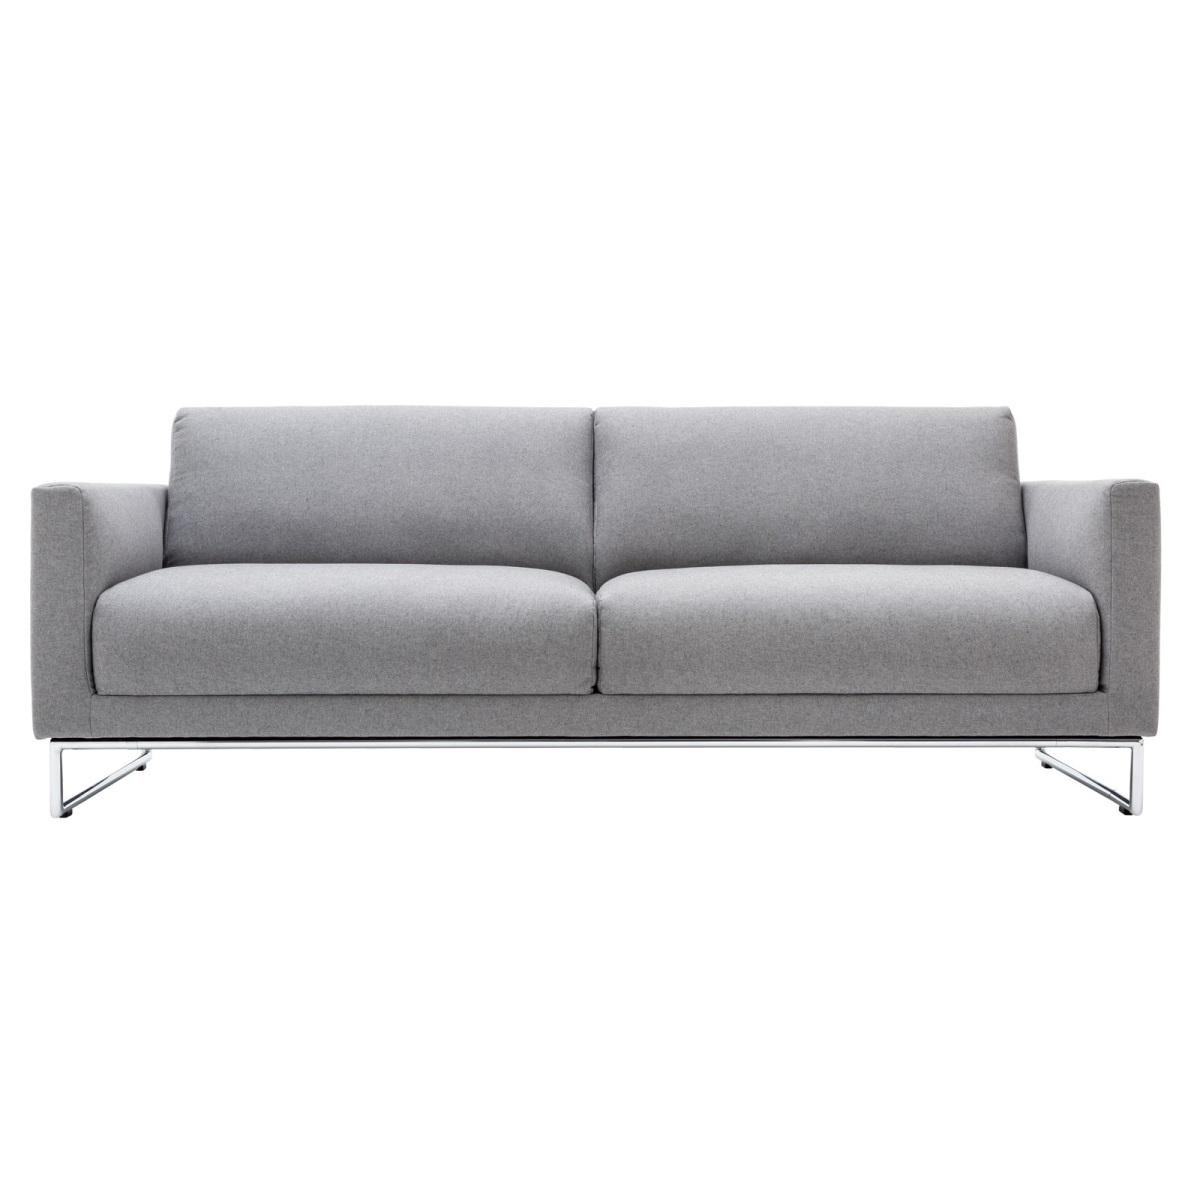 Full Size of Rolf Benz Sofa Gebraucht Ebay Couch For Sale Furniture Usa List Mio Freistil 180 Kaufen 141 Leder Bed Vida Preis Leather Nova Dono Sofas Verkaufen In L Form Sofa Rolf Benz Sofa